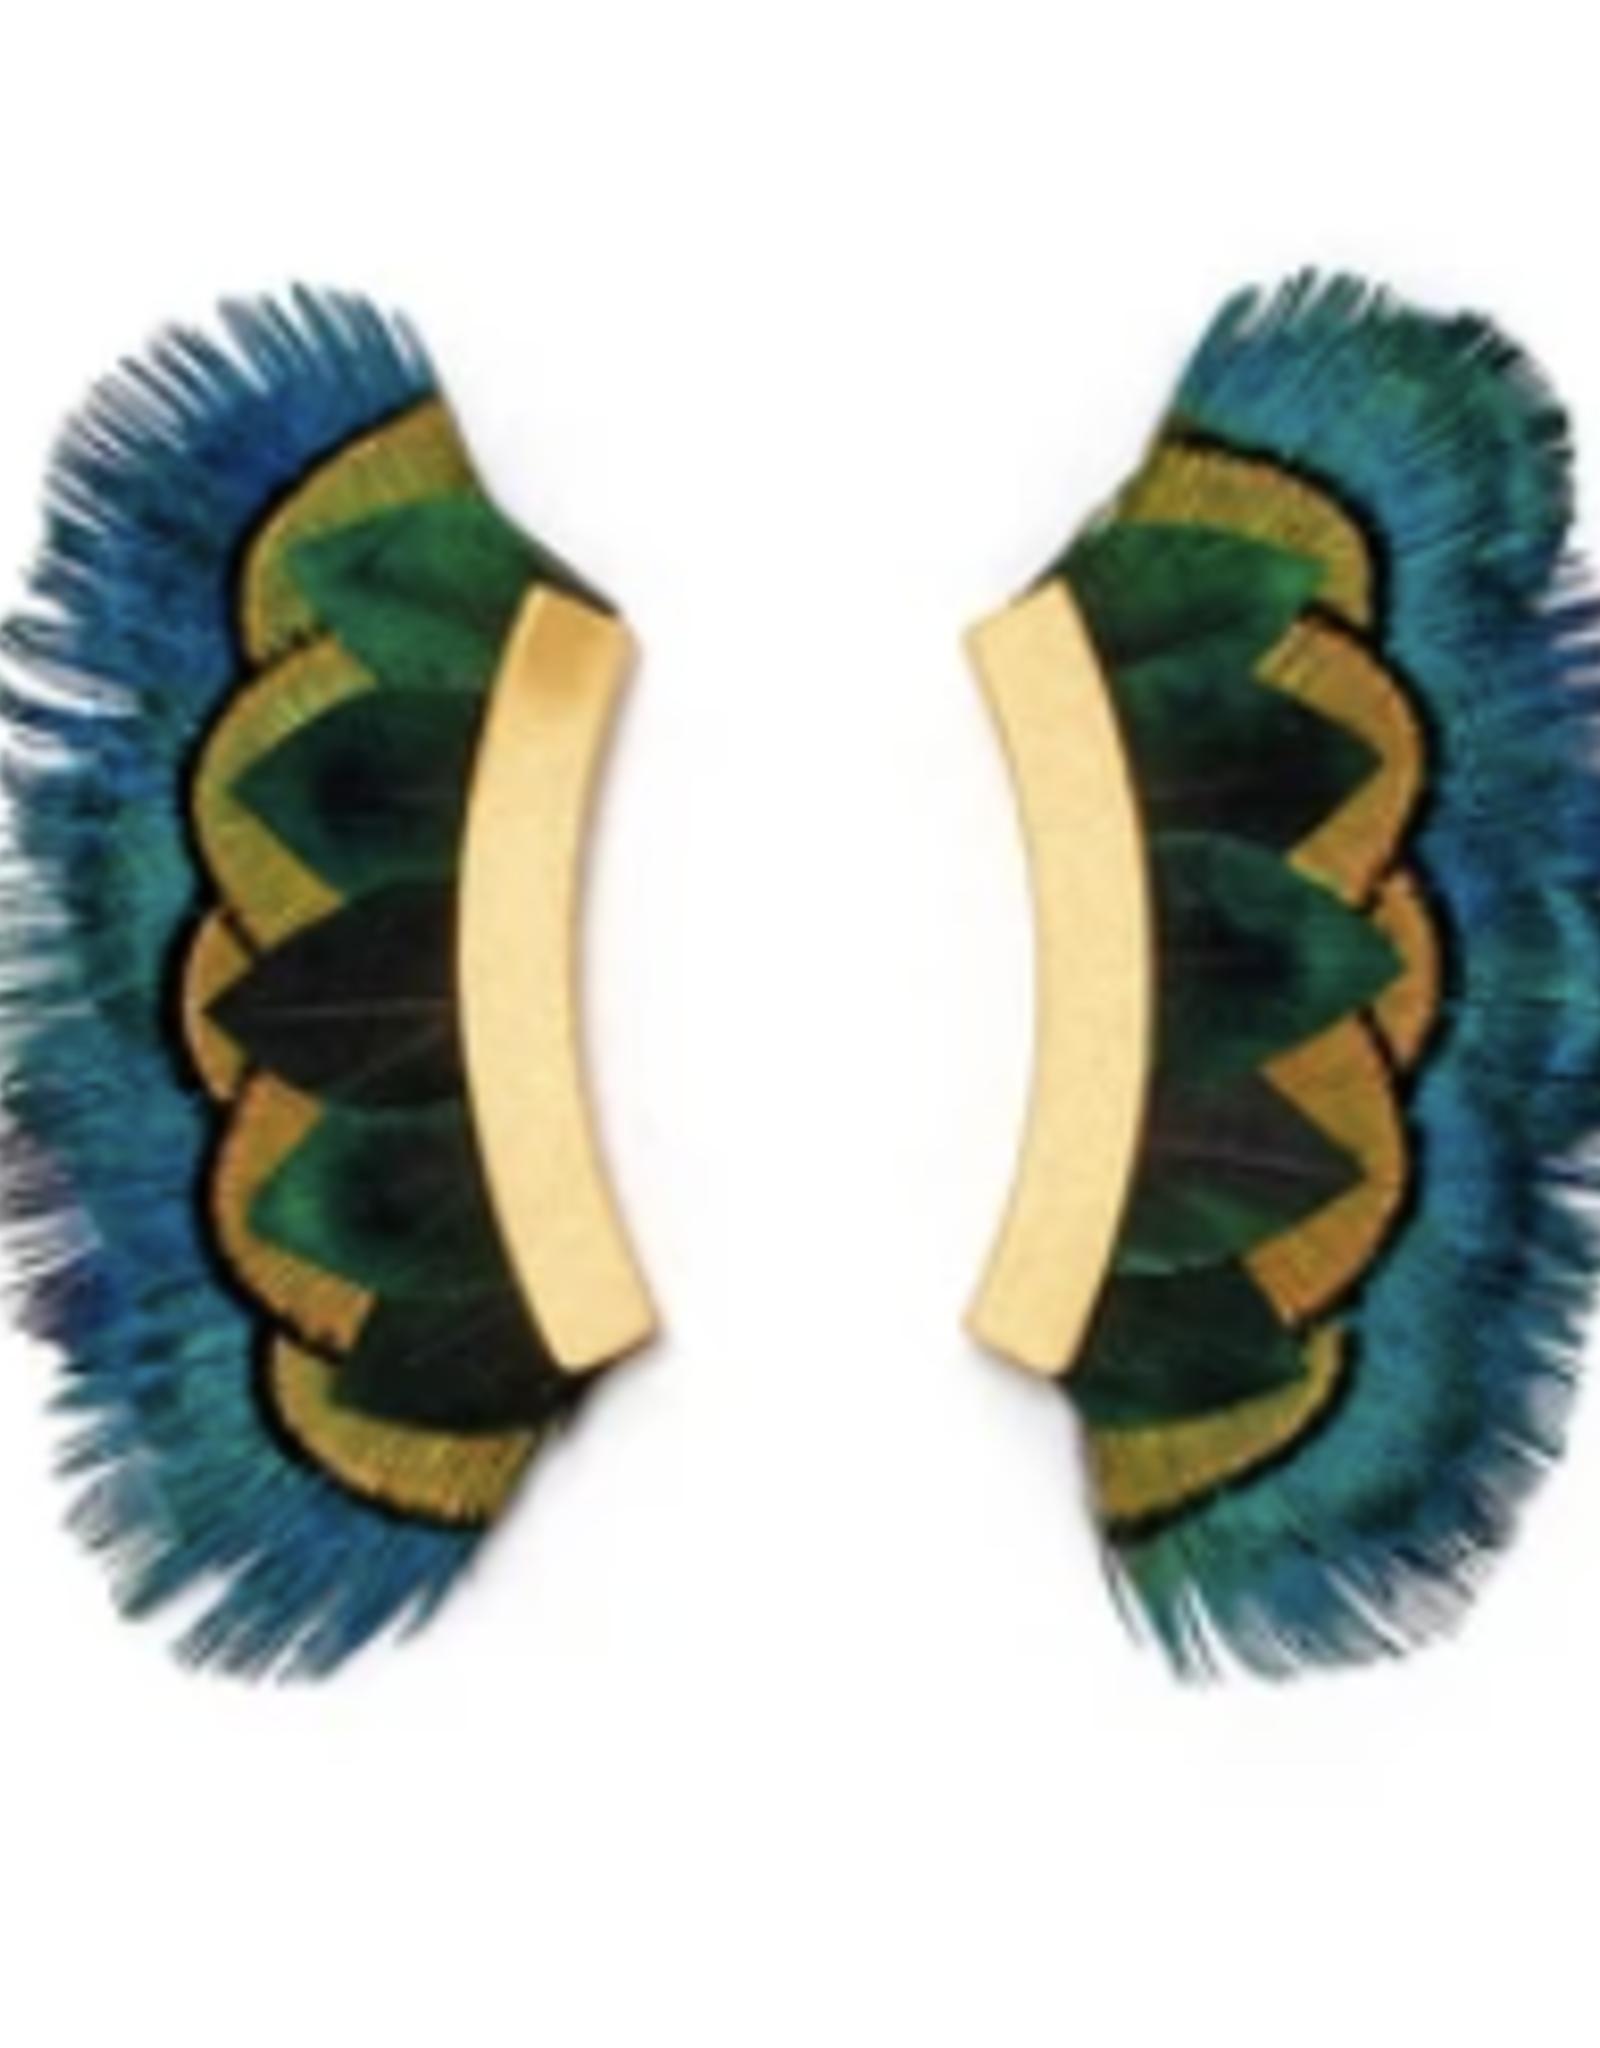 Brackish Westmore Earrings - Peacock Feathers